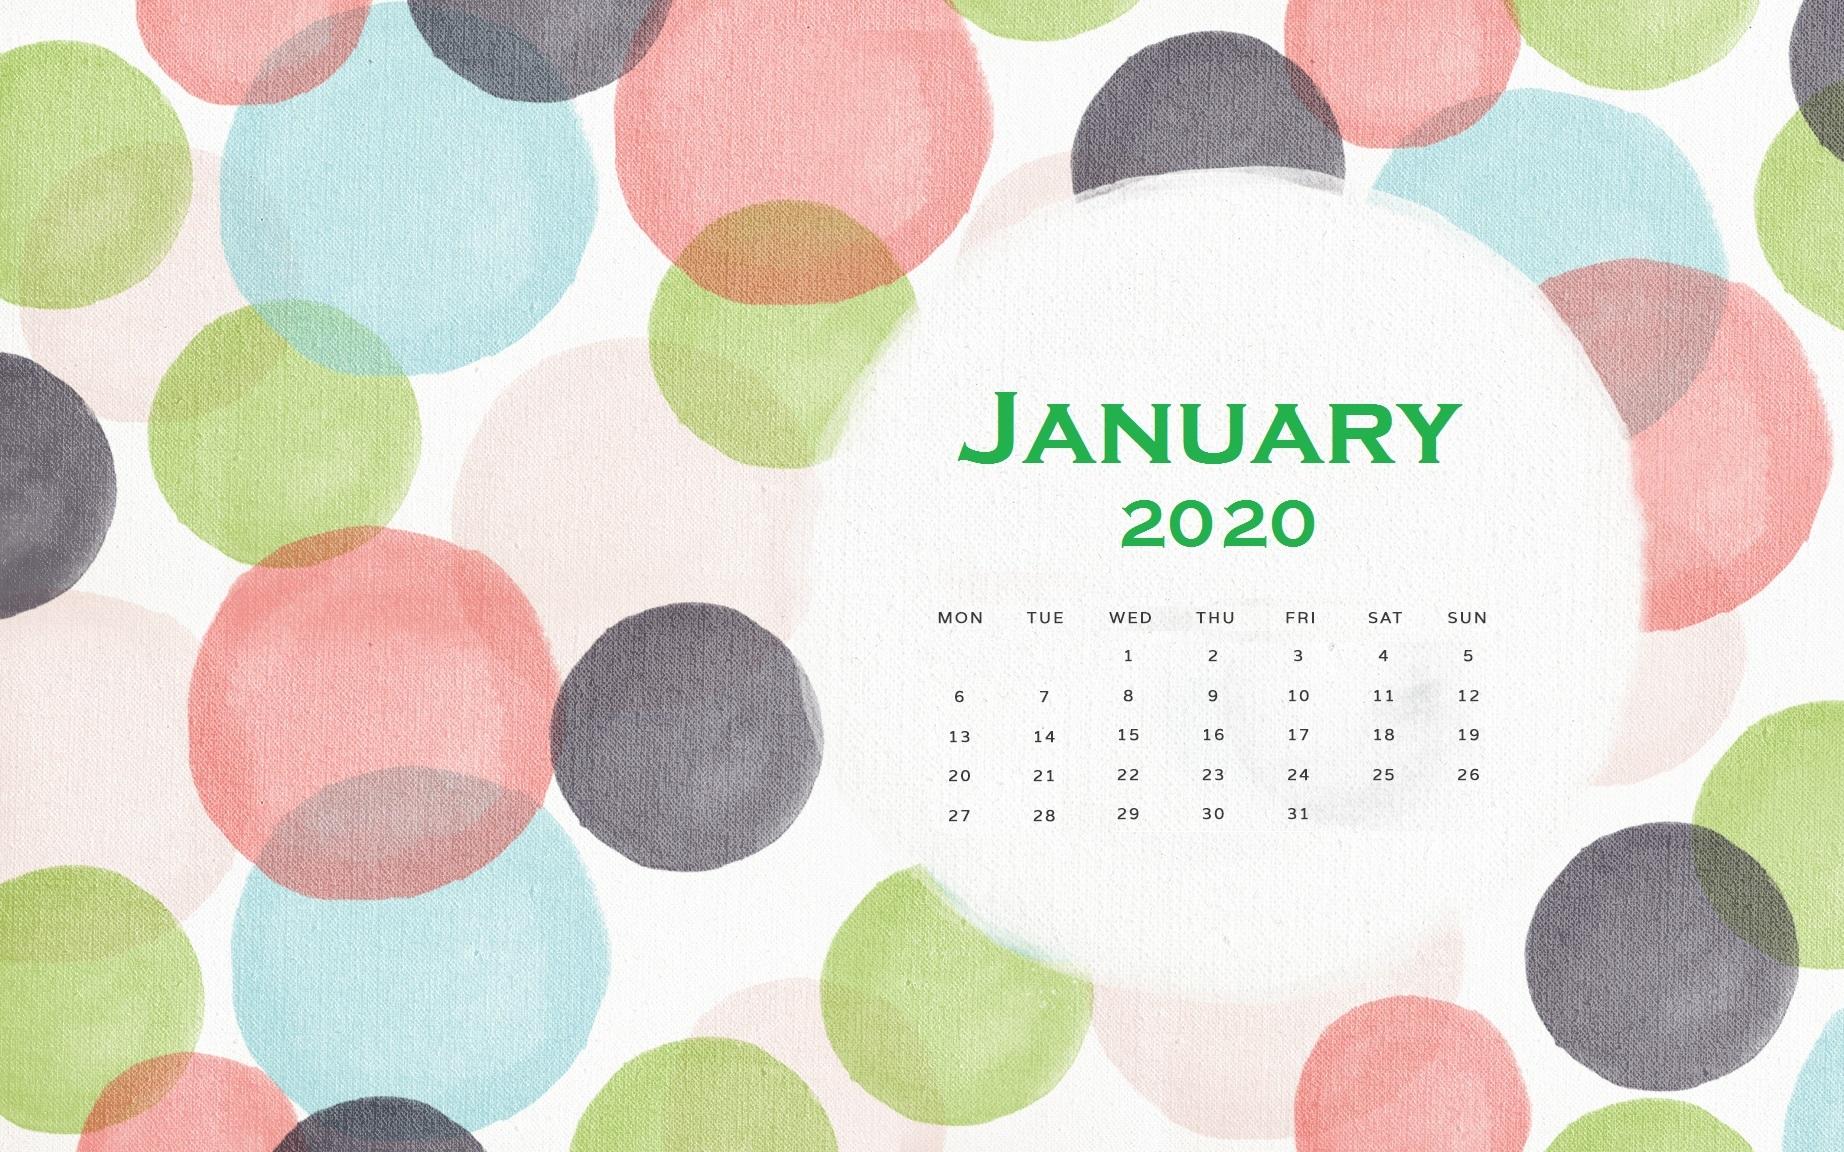 January 2020 Background Screensaver Latest Calendar 1844x1152